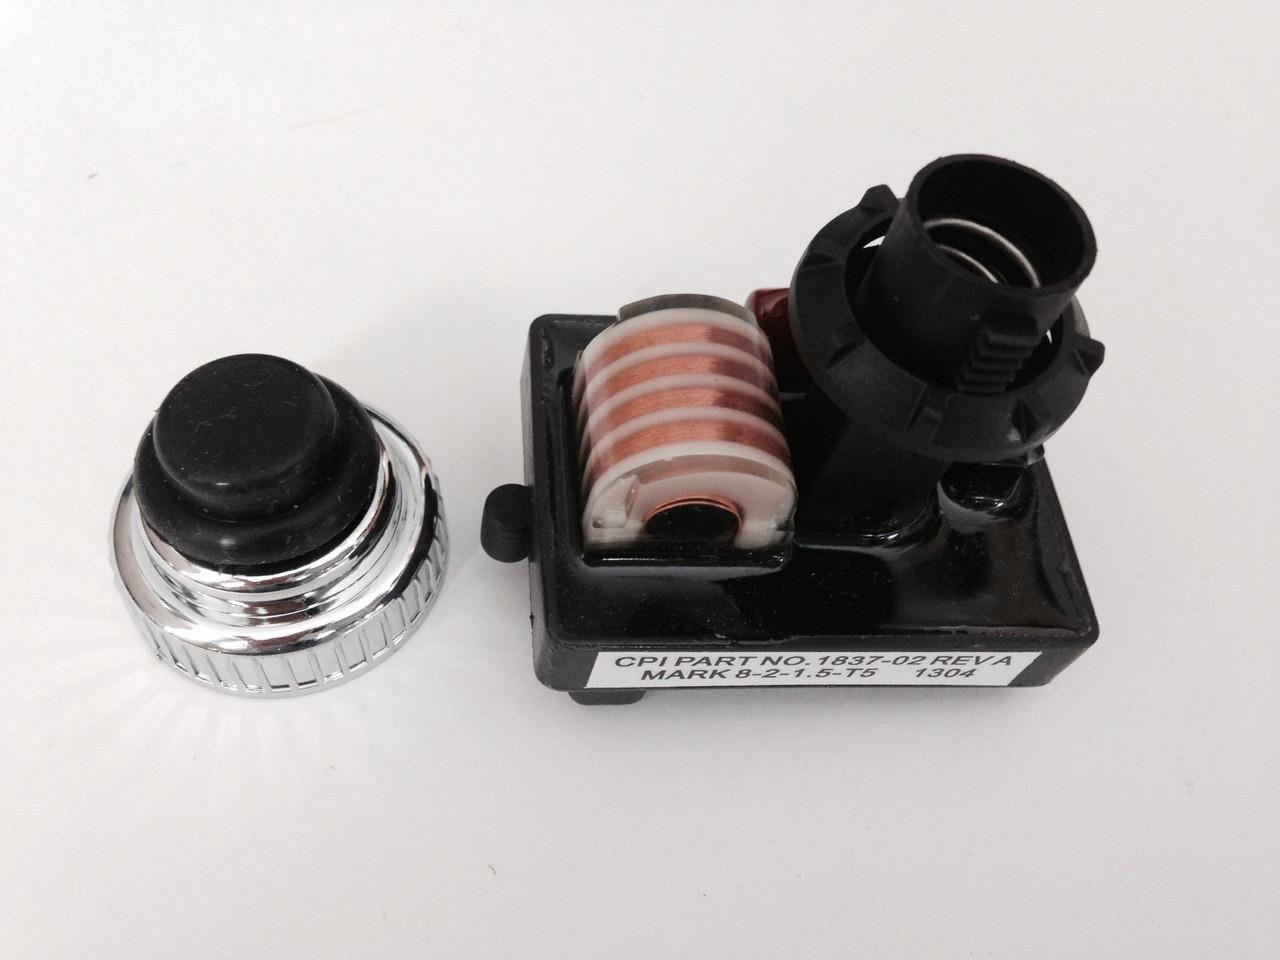 3199-32 Fire Magic Battery Spark Generator, 2 Prong